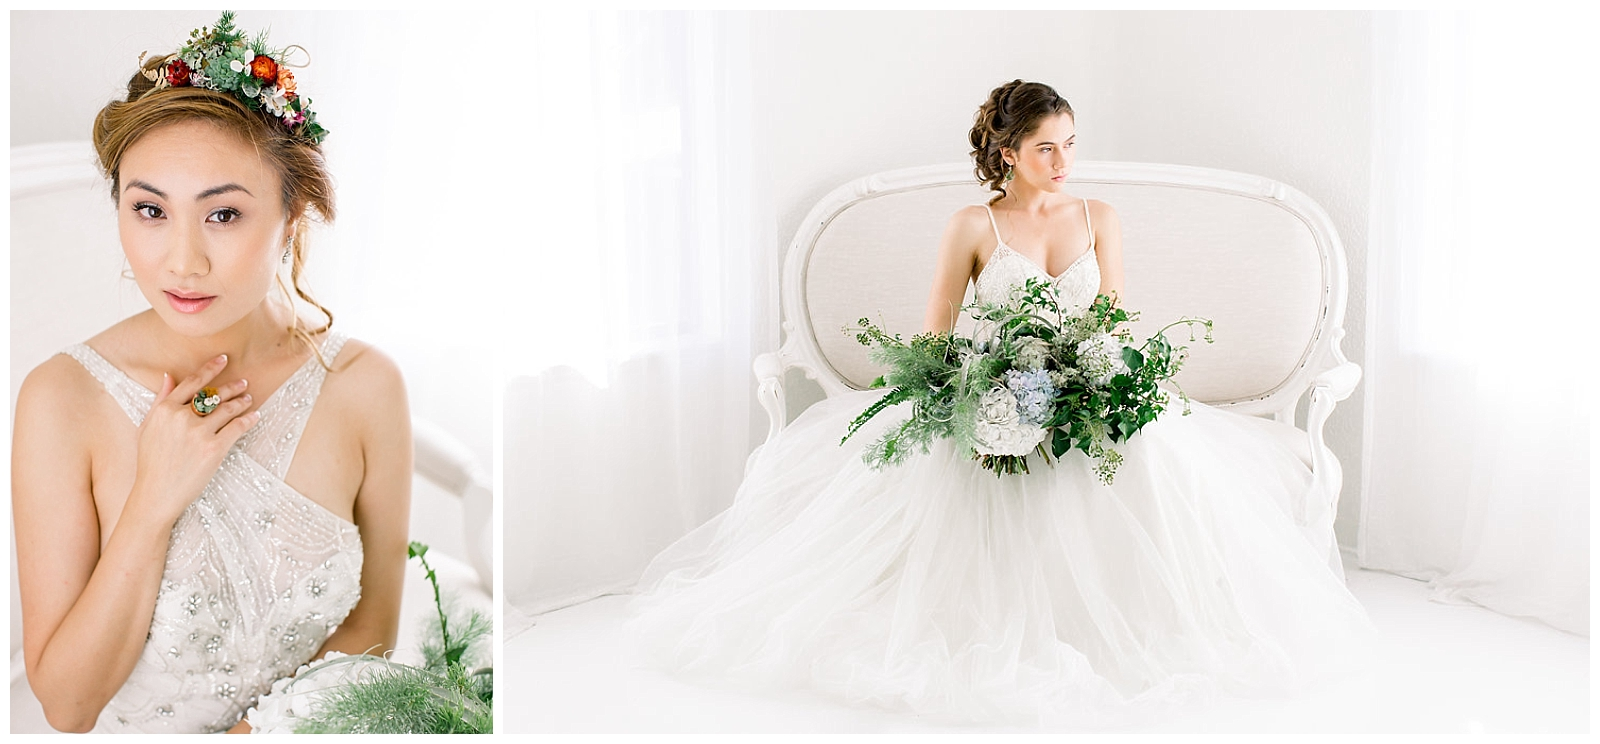 Living-Accessories-styled-shoot-de-joy-photography-epiphany-boutique-asian-bride.jpg